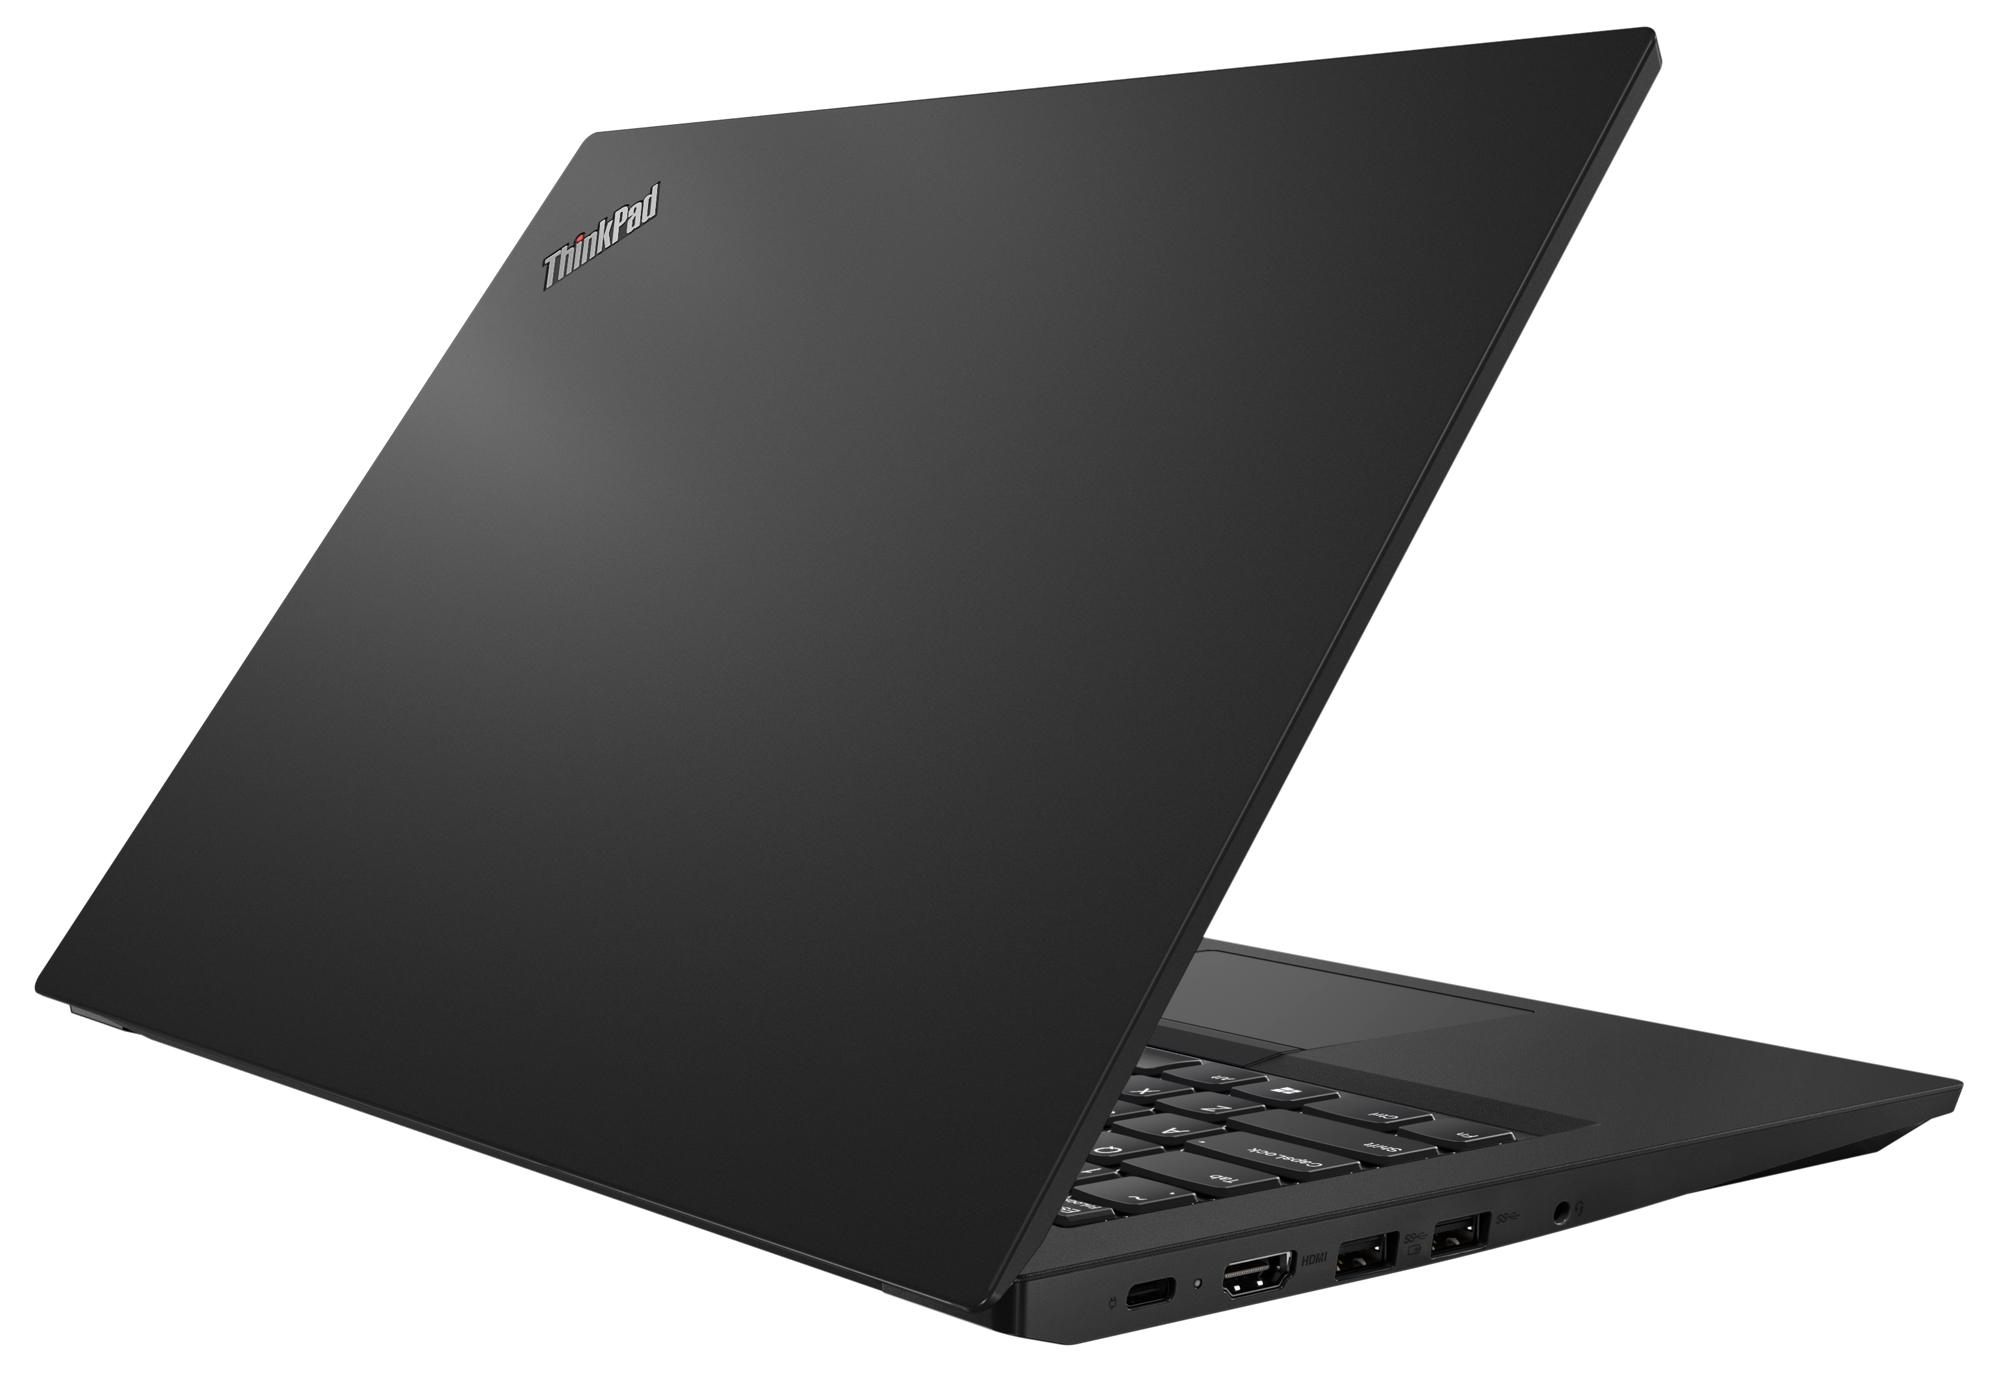 Фото  Ноутбук ThinkPad E480 (20KN007URT)